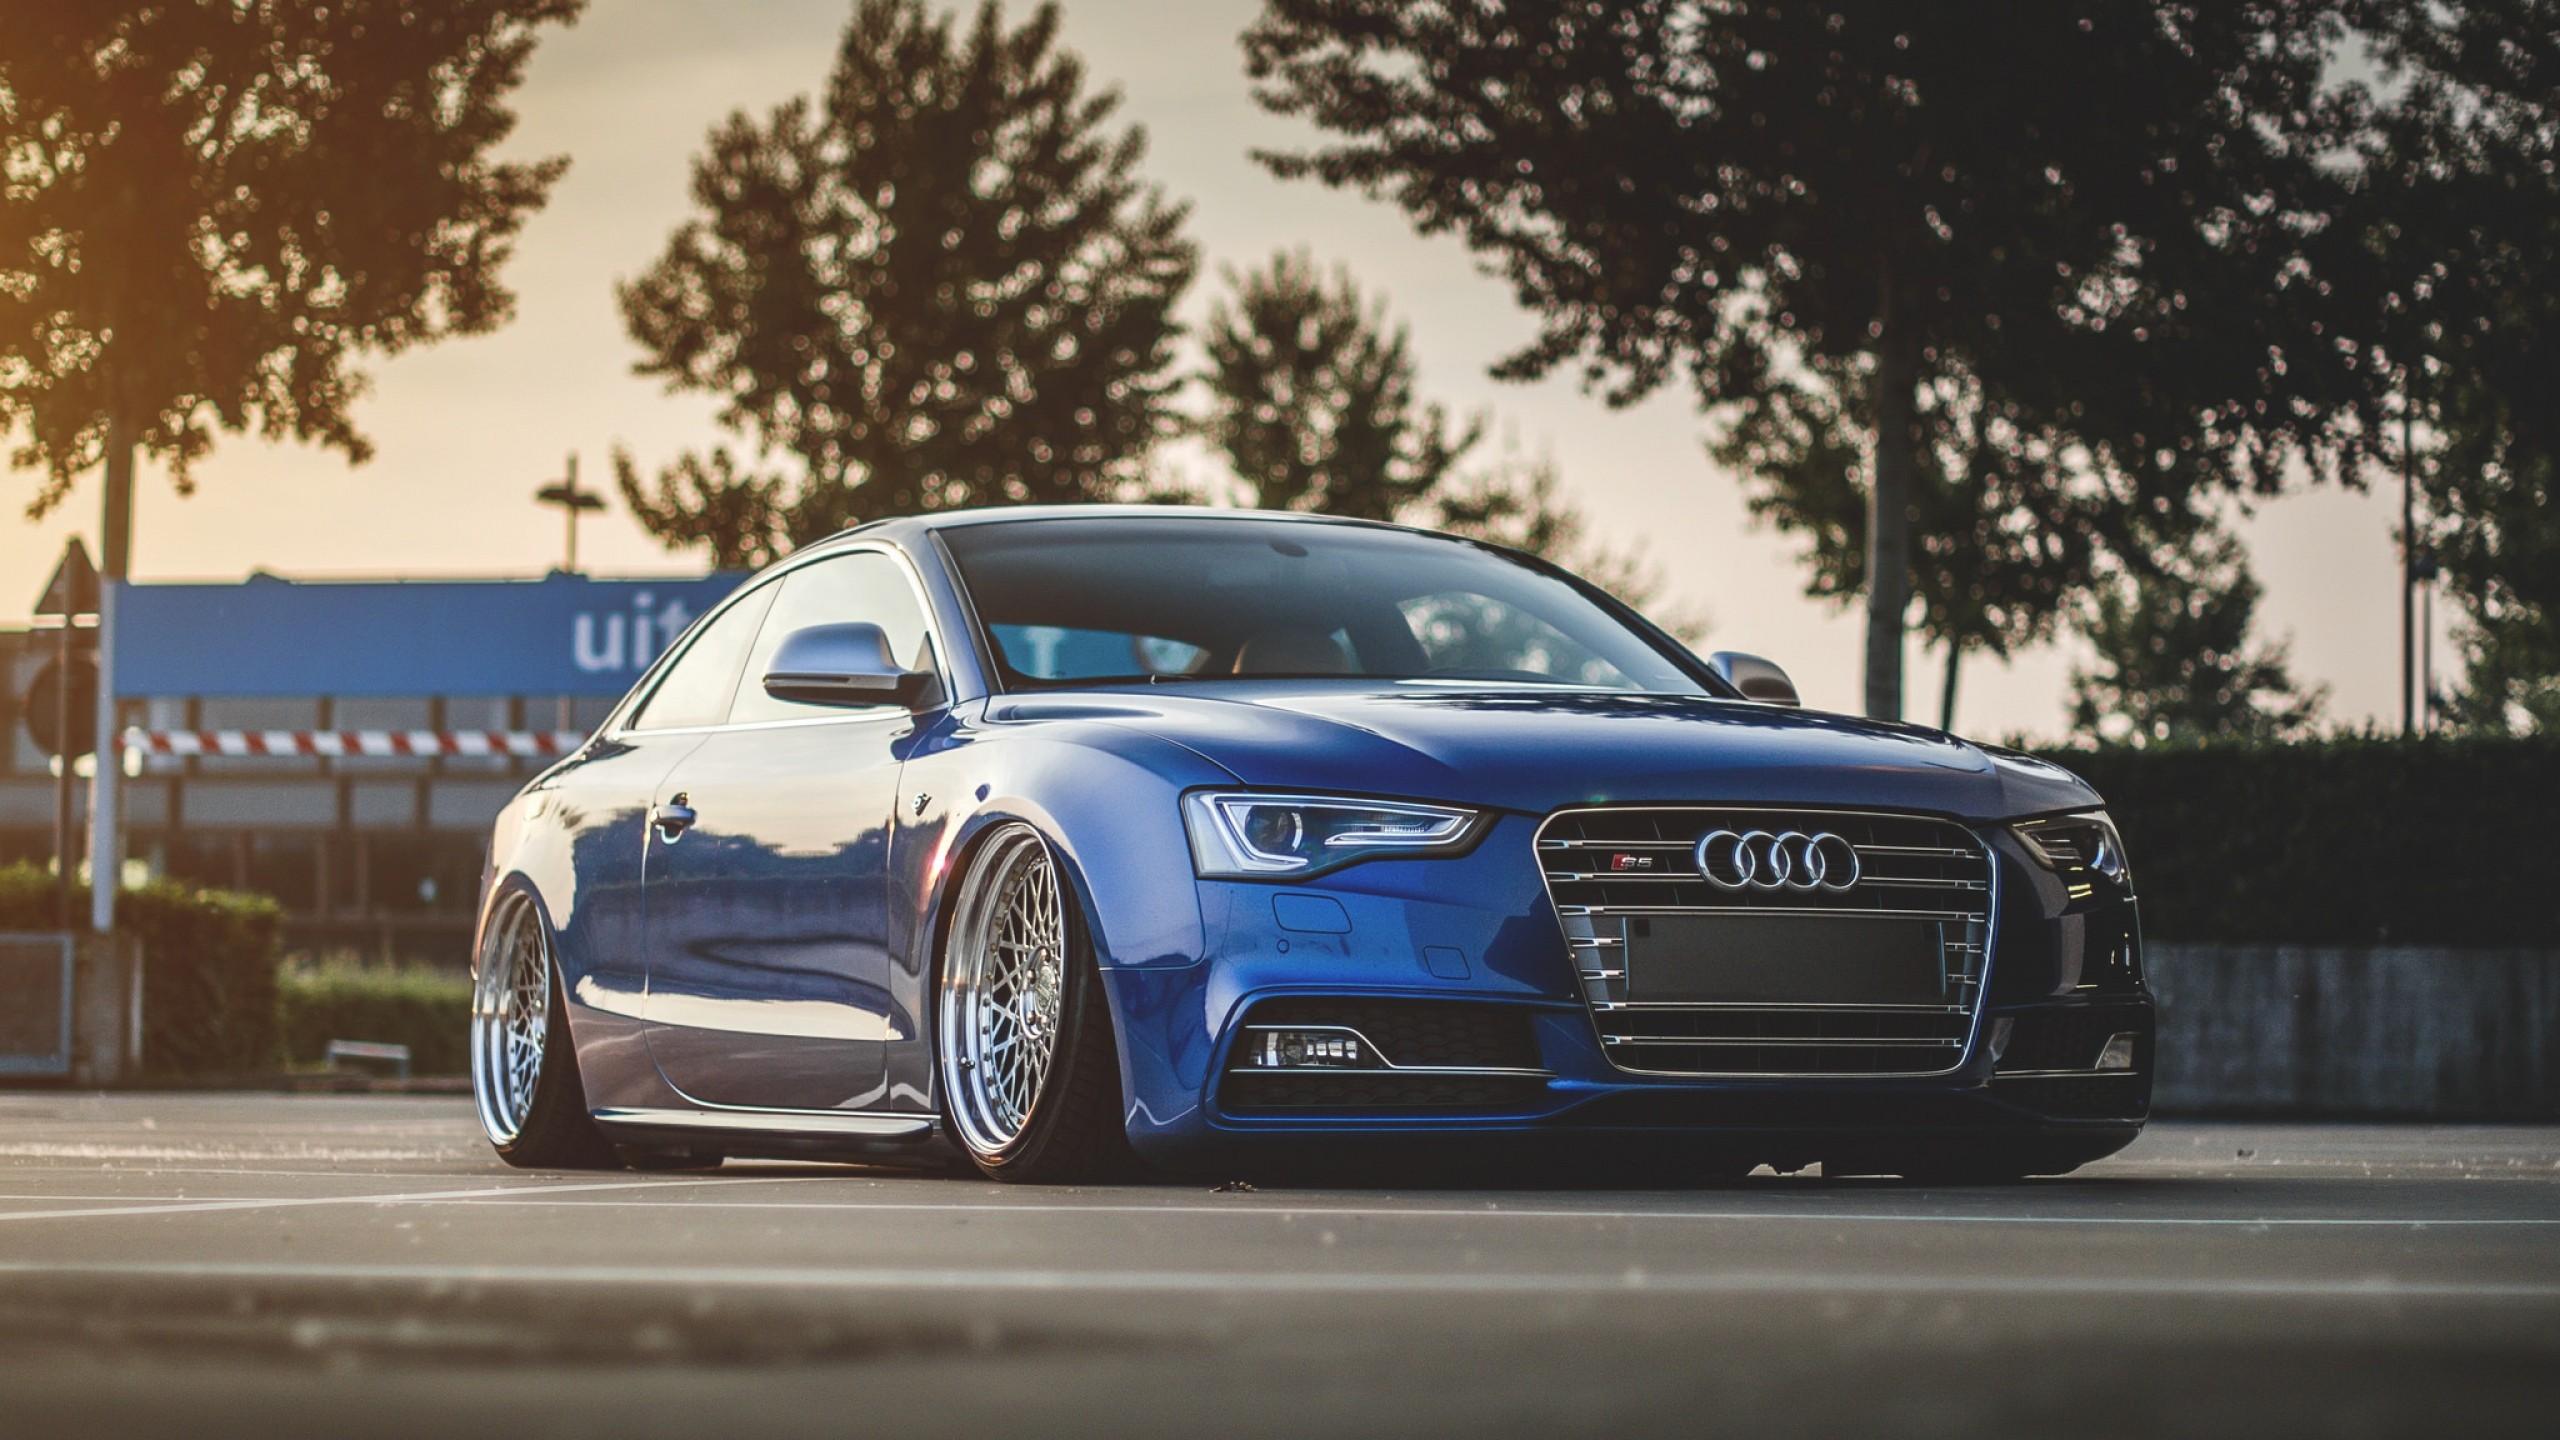 Wallpaper sports car stanceworks german cars audi s5 for Car exterior design